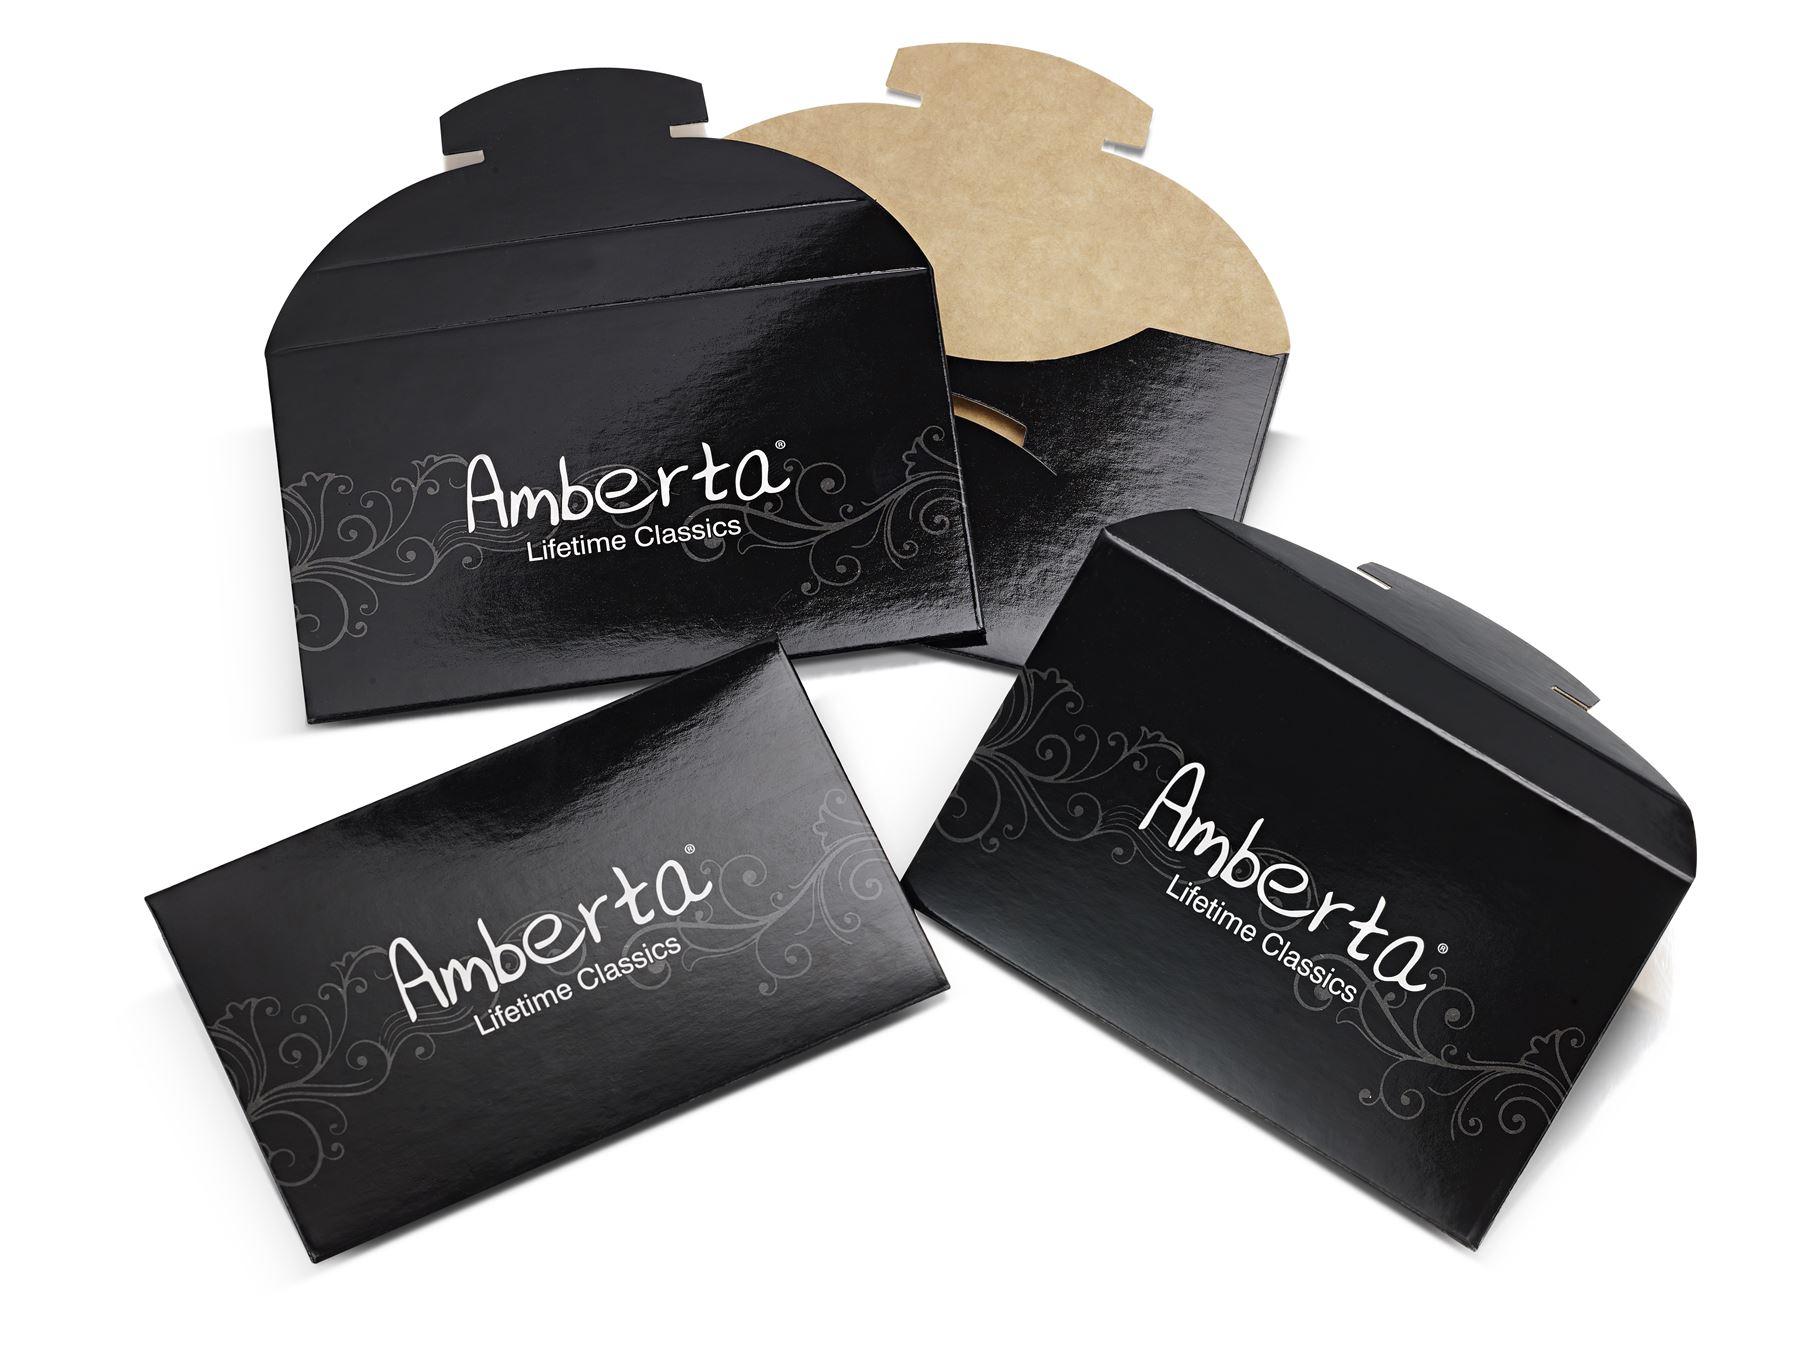 Amberta-Jewelry-925-Sterling-Silver-Adjustable-Bracelet-Italian-Bangle-for-Women miniature 40